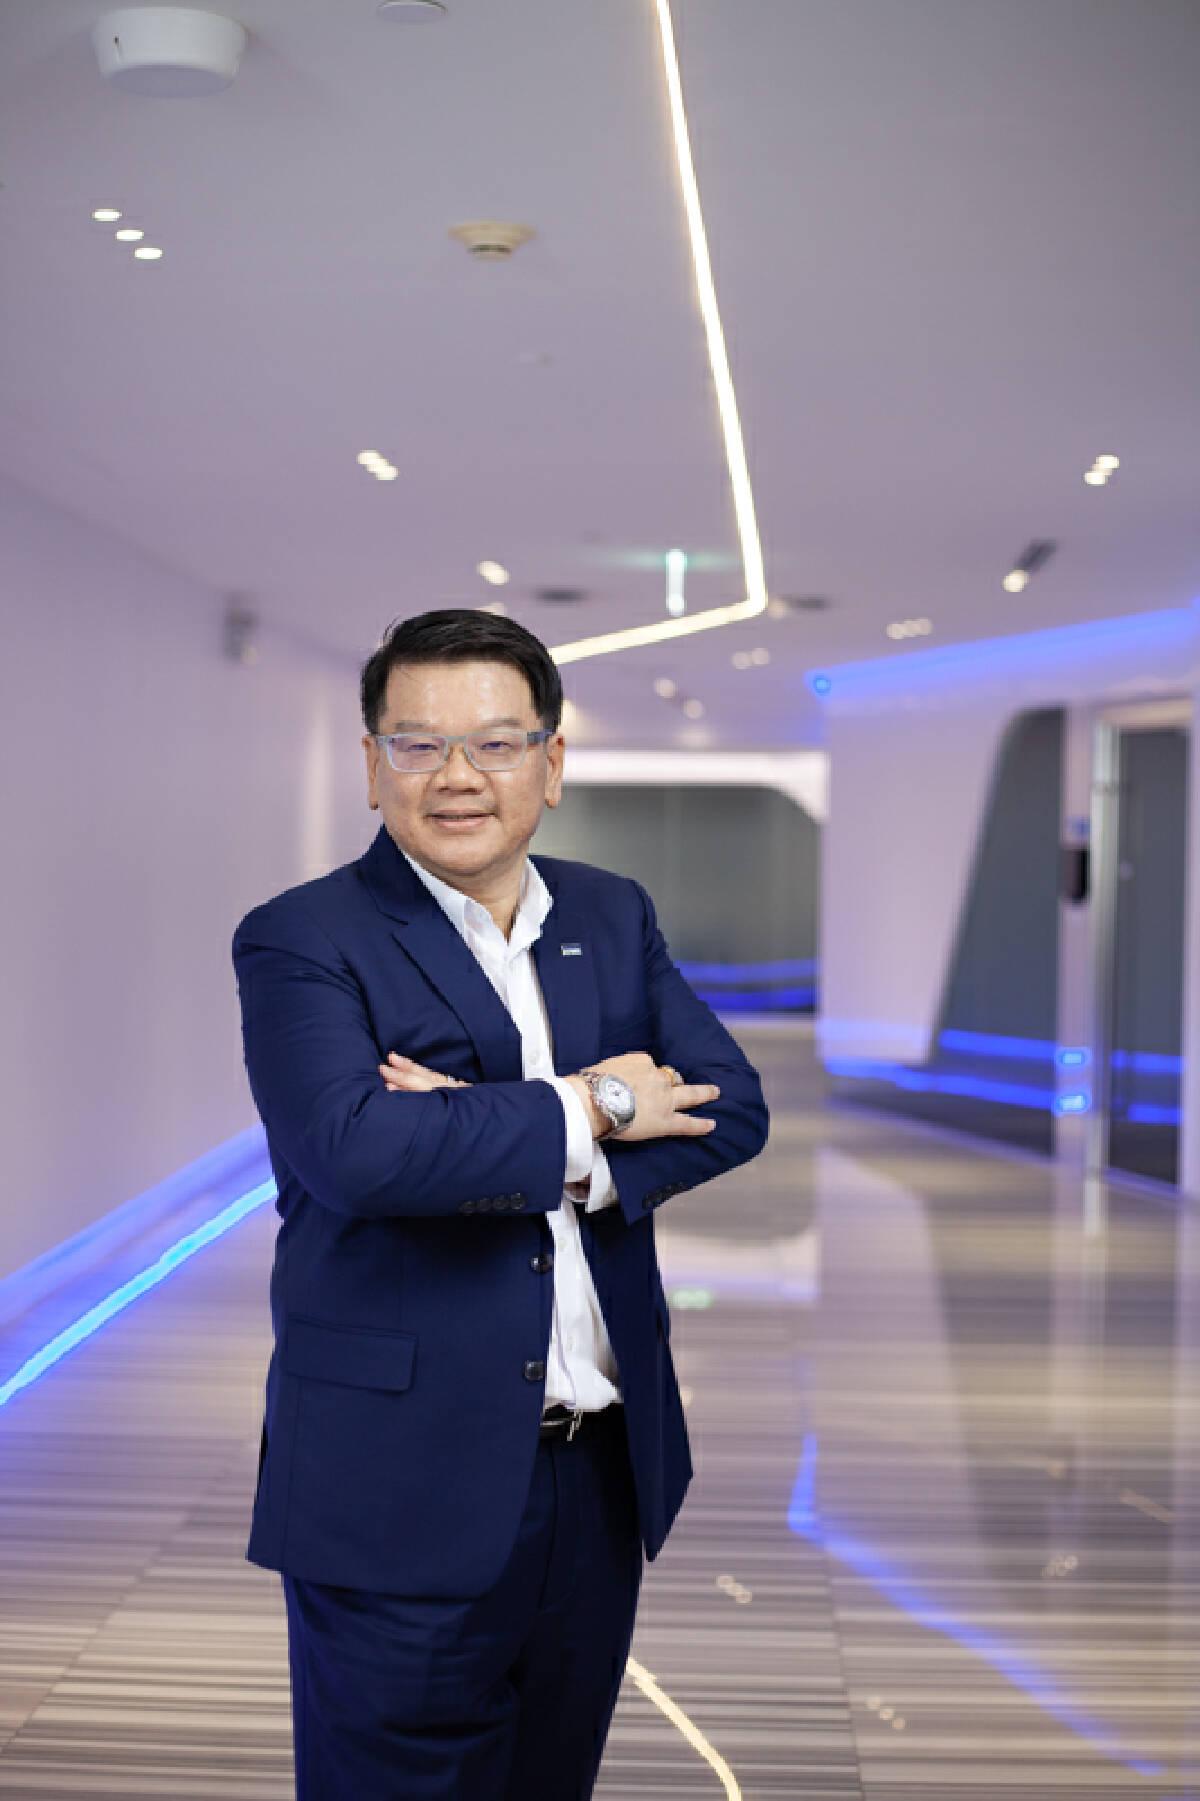 Charoen Phosamritlert, Chief Executive Officer, KPMG in Thailand, Myanmar and Laos.